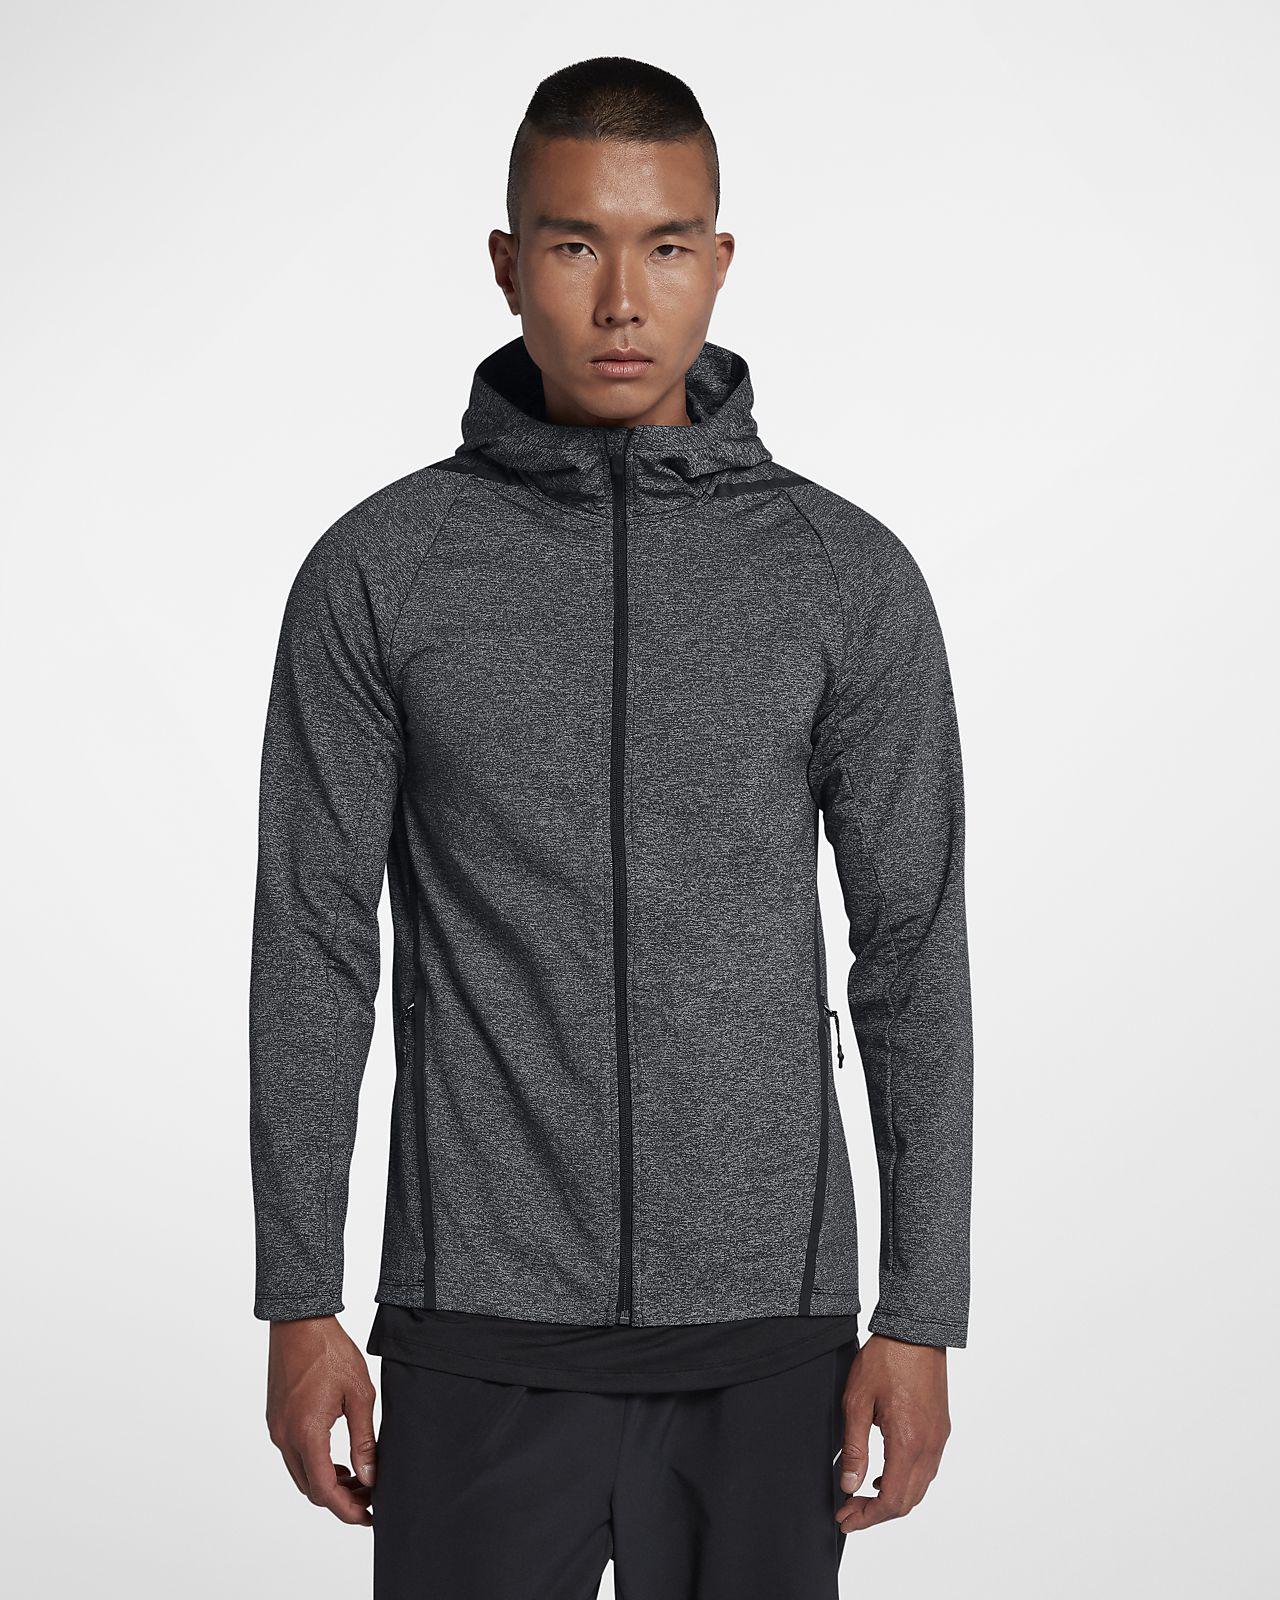 a9f36d50b18 Nike Dri-FIT Men s Long-Sleeve Full-Zip Training Hoodie. Nike.com GB